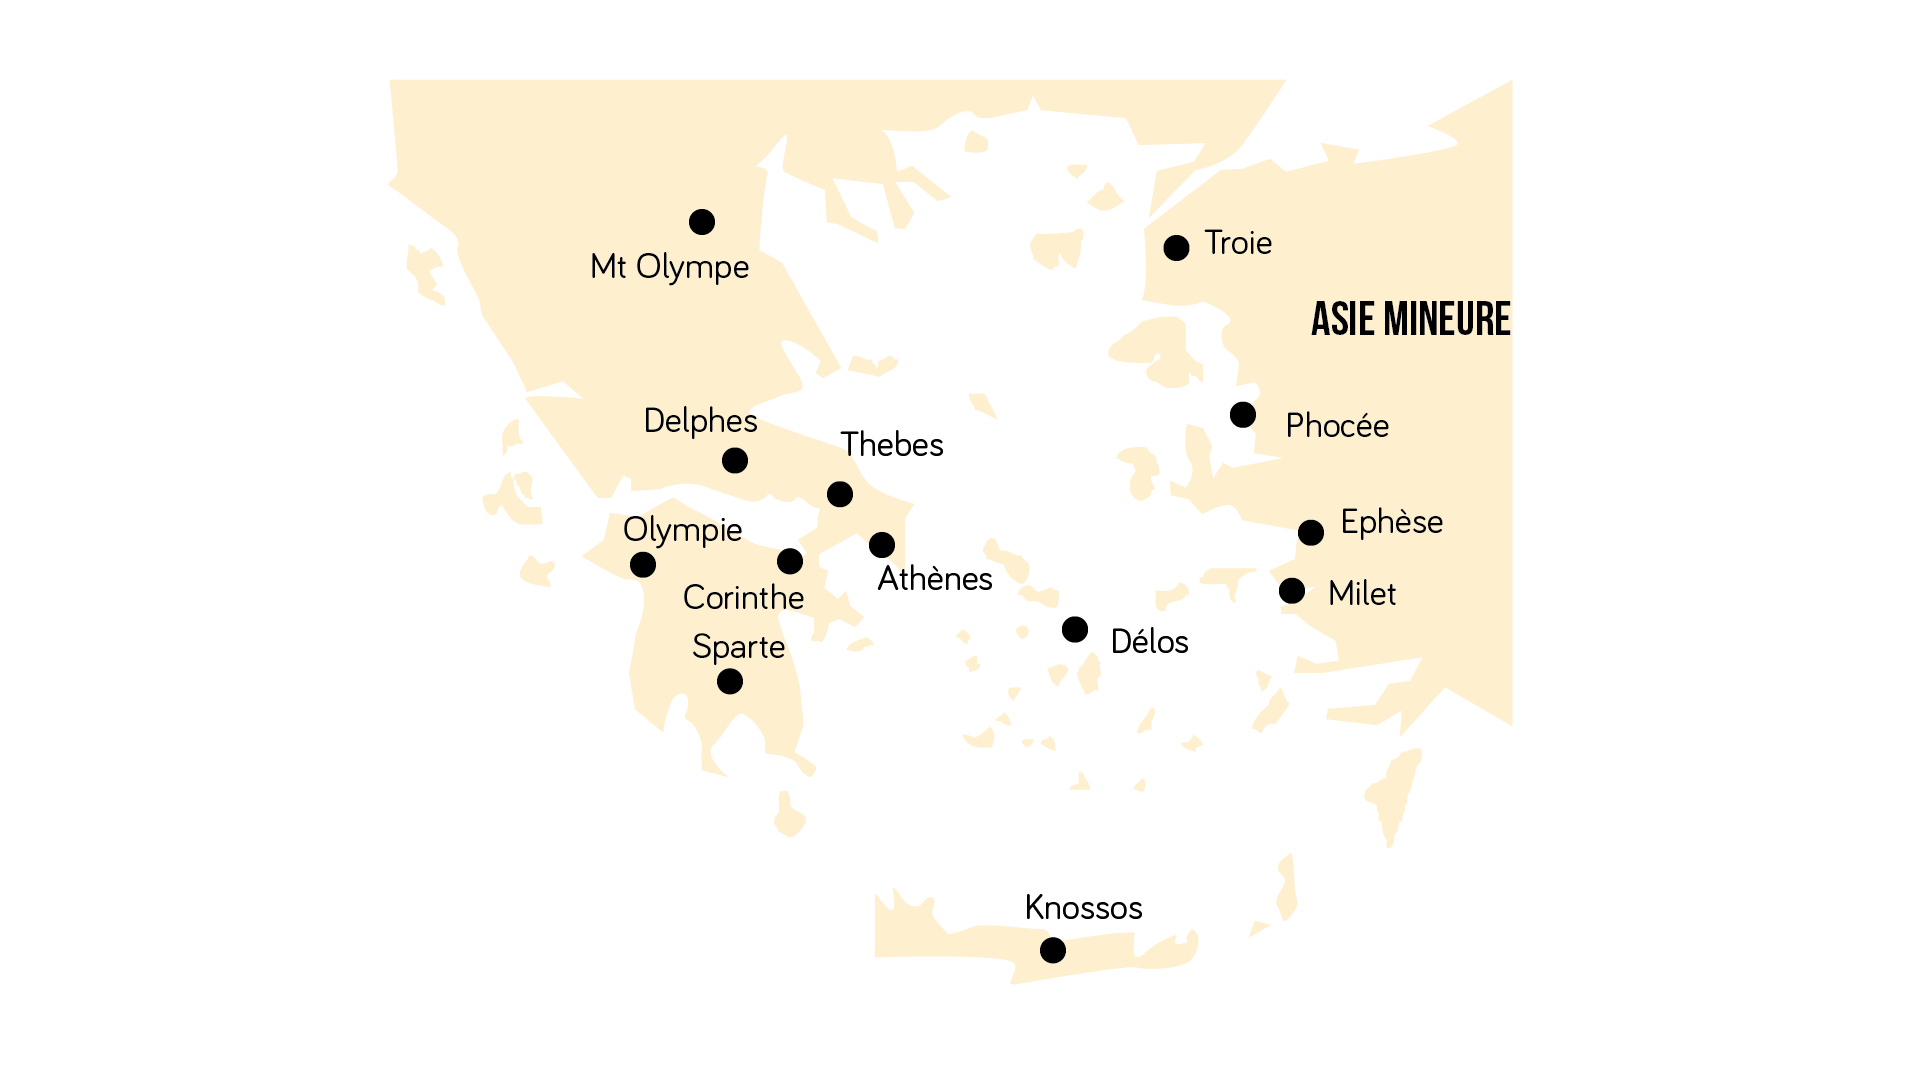 Carte des principales cités grecques